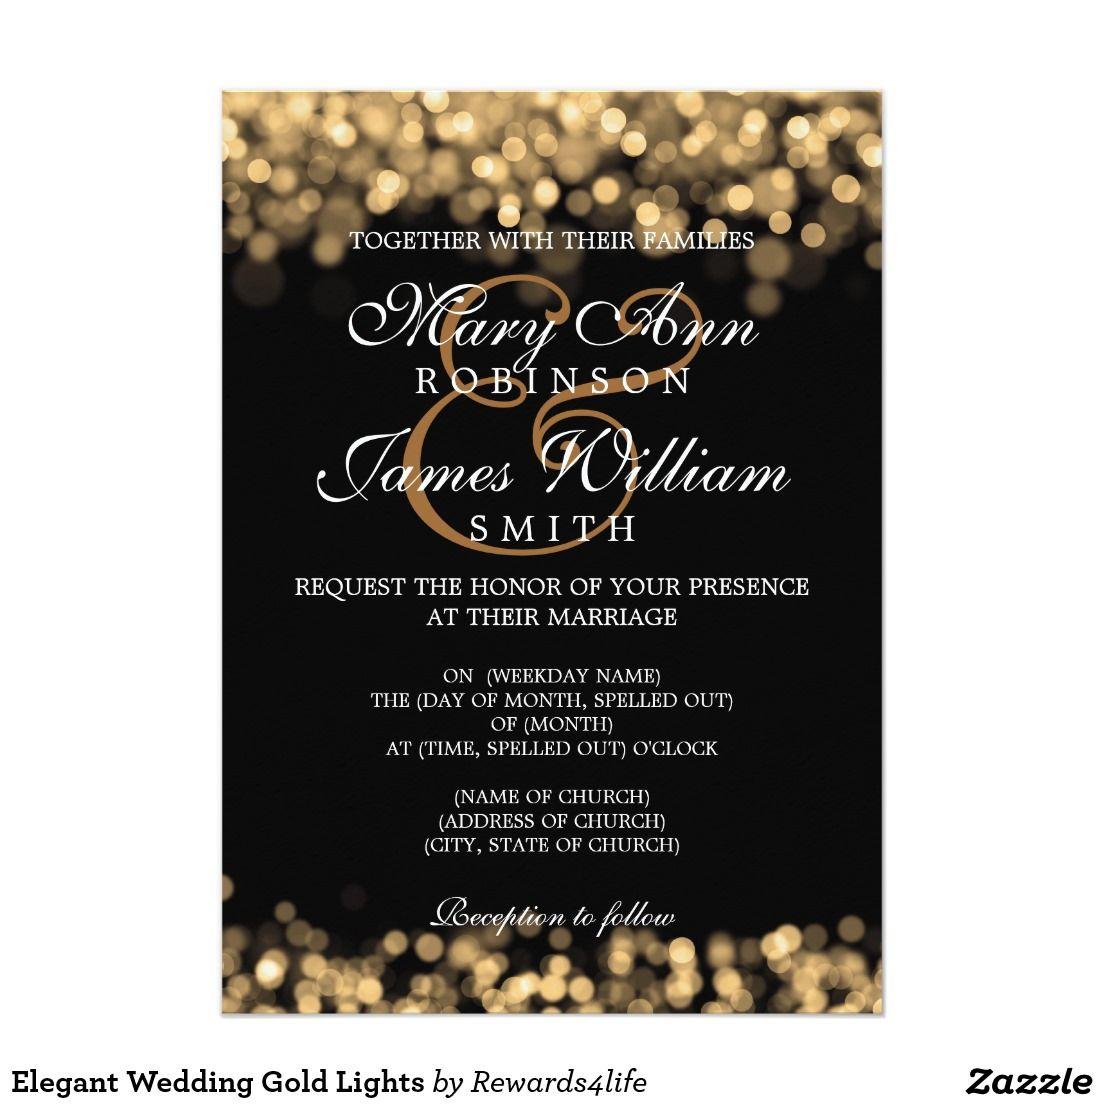 classy wedding invitations Elegant Wedding Gold Lights Card